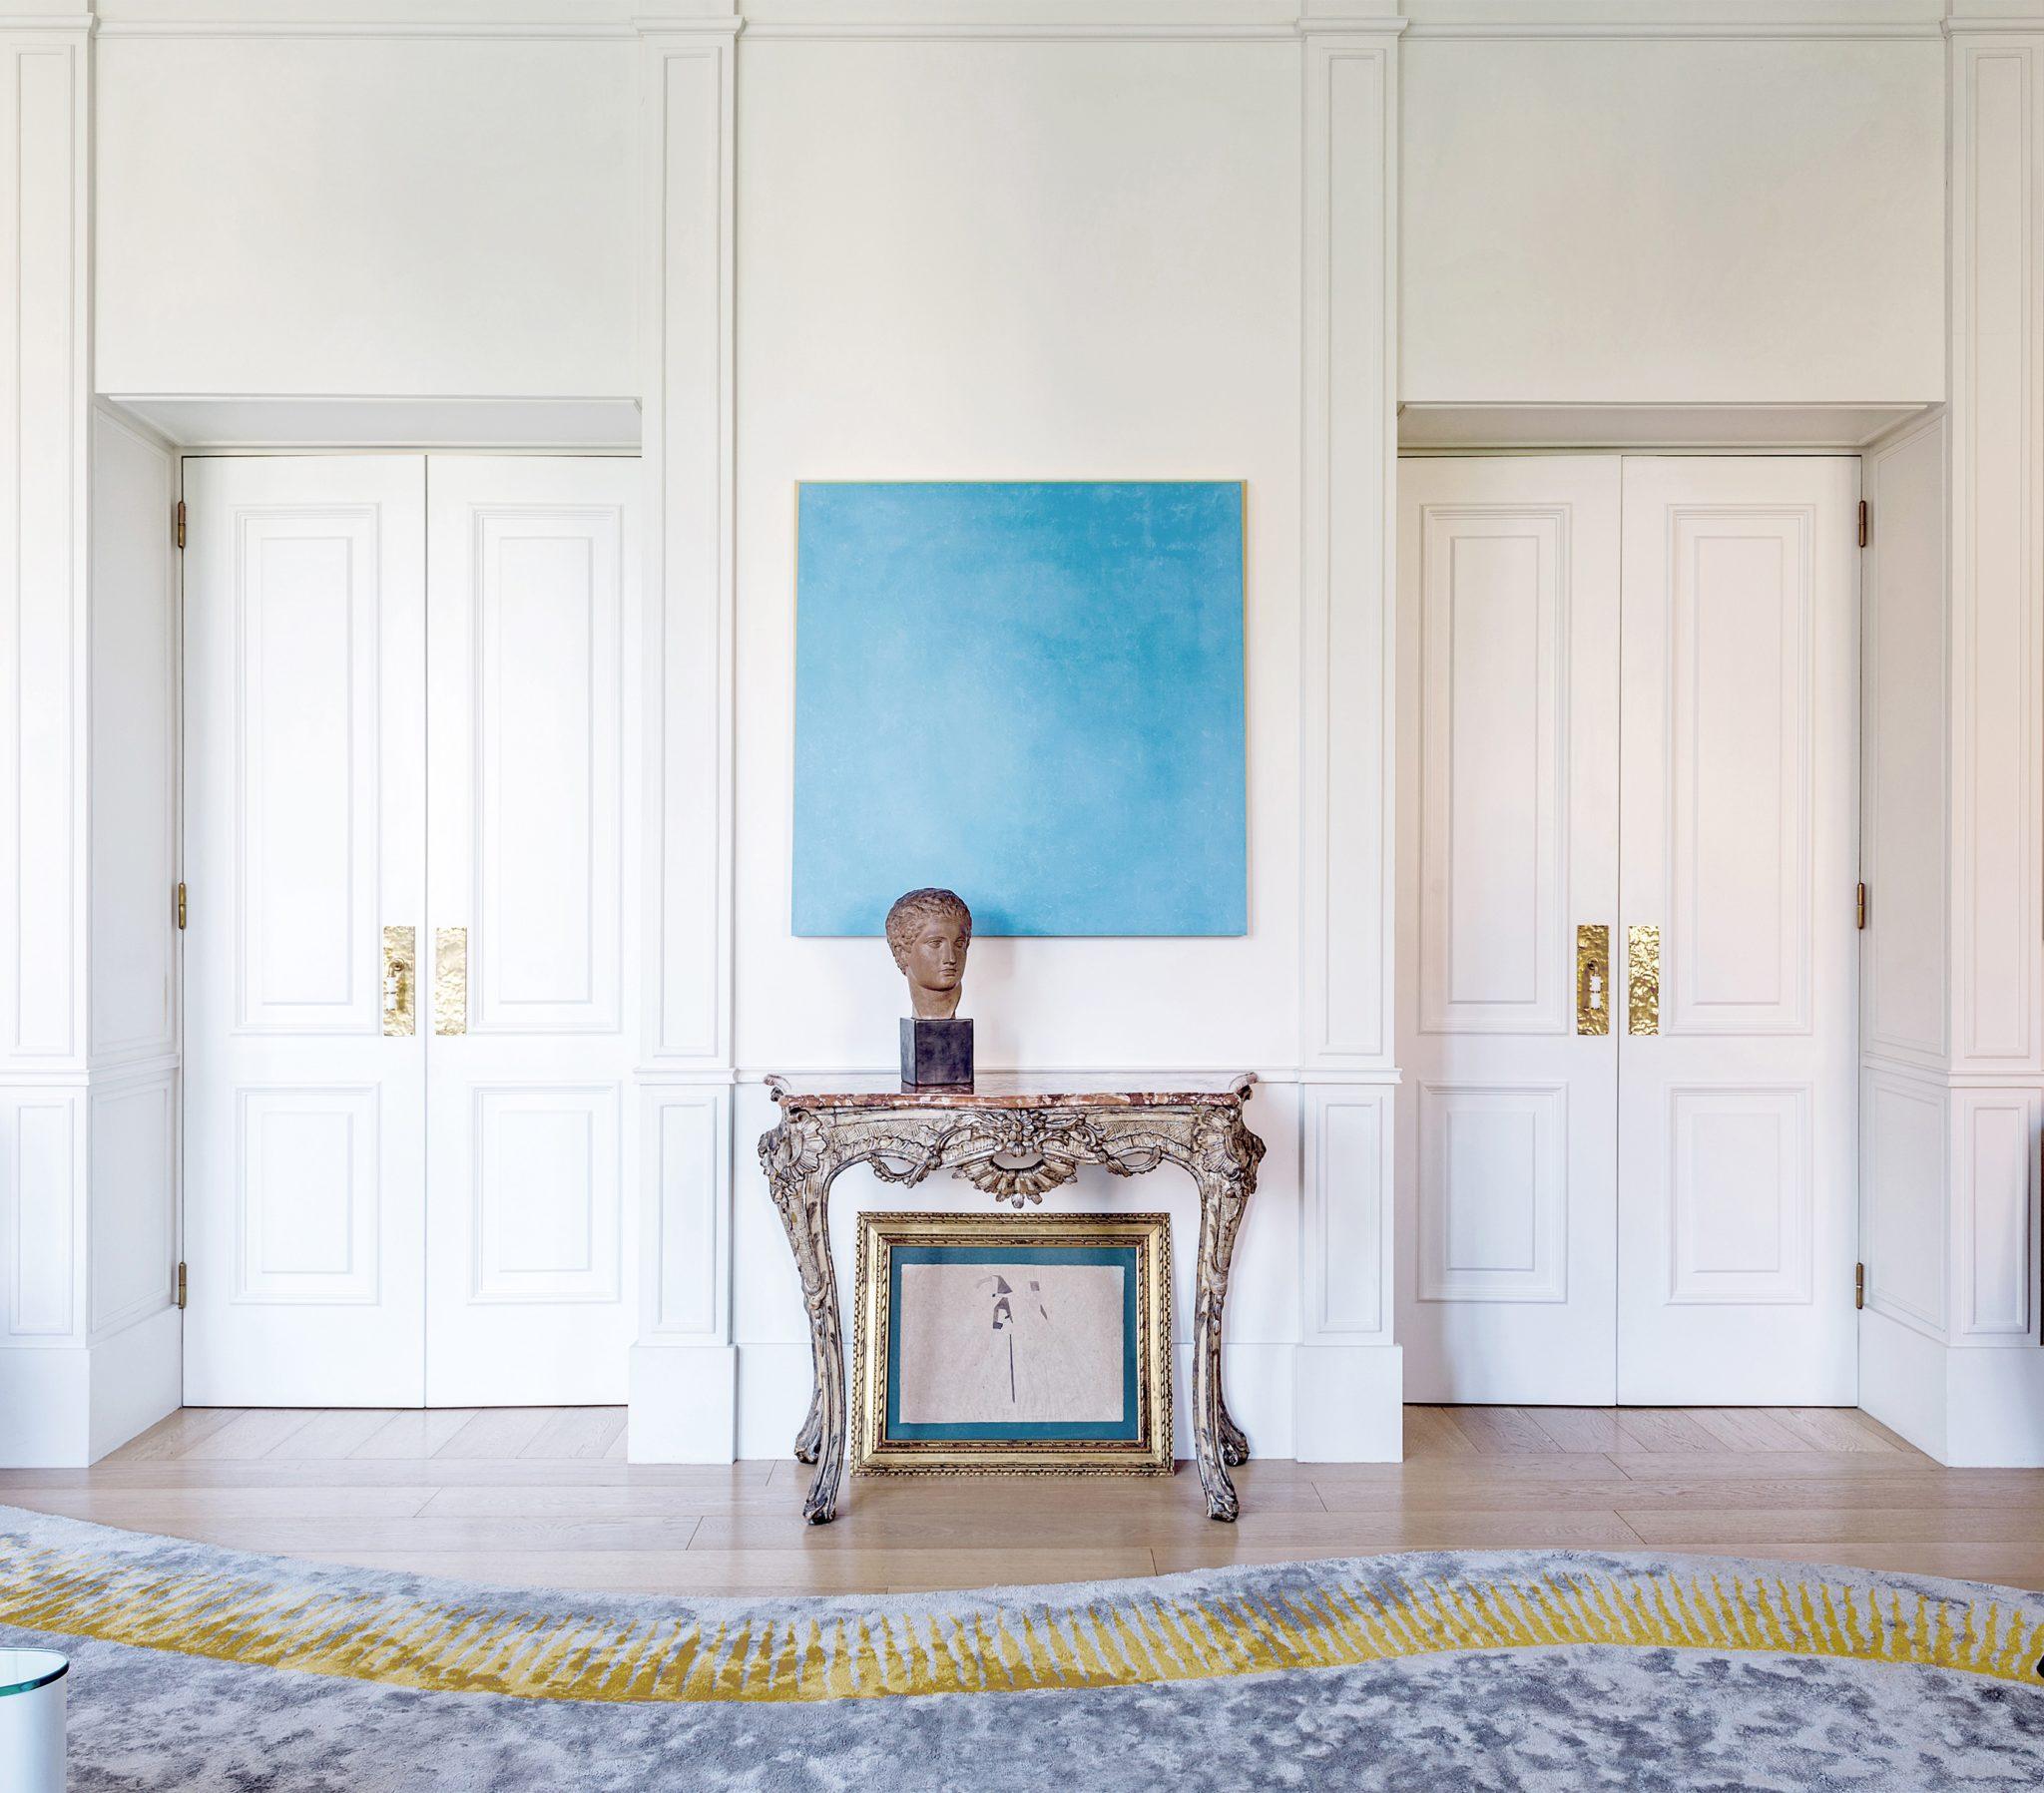 In Salvagni's living room in Rome, a Louis XV console is juxtaposed witha 2011 painting by Ettore Spalletti, Una giornata di sole e oro.